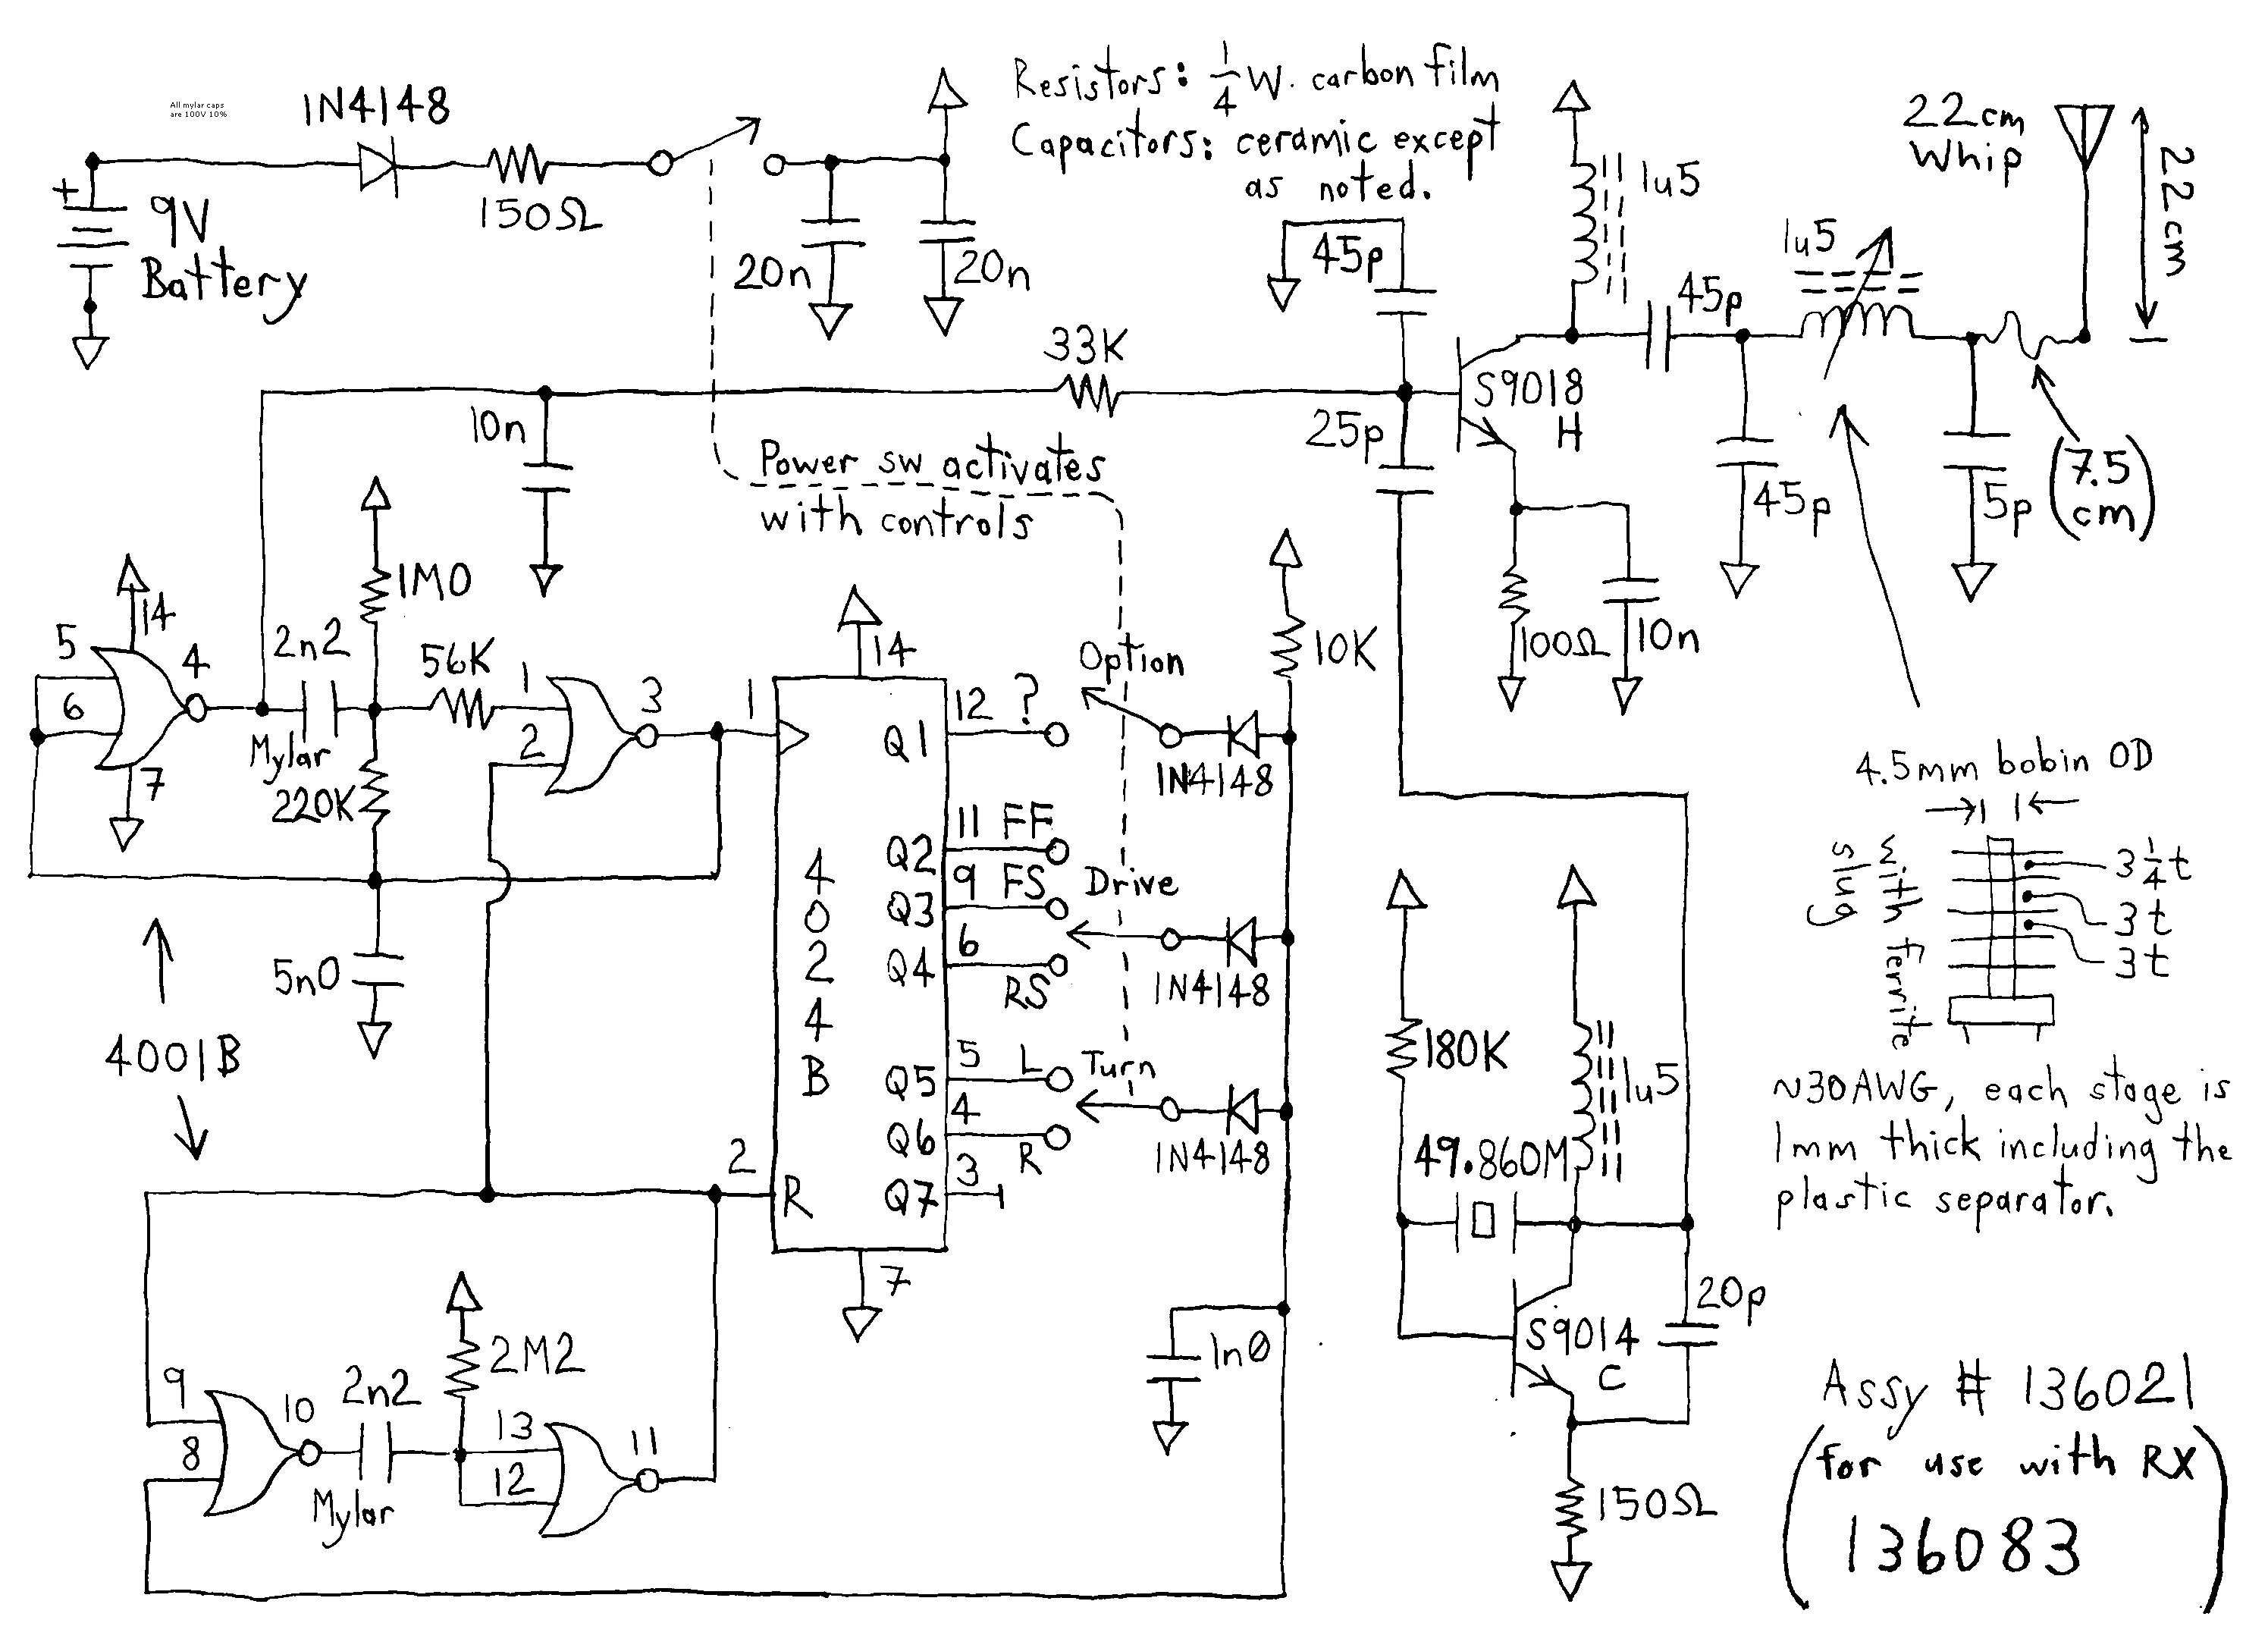 Klipsch Promedia 2 1 Wiring Diagram Multiple Amplifier Wiring Diagram Best Amp Wiring Diagram Car Of Klipsch Promedia 2 1 Wiring Diagram